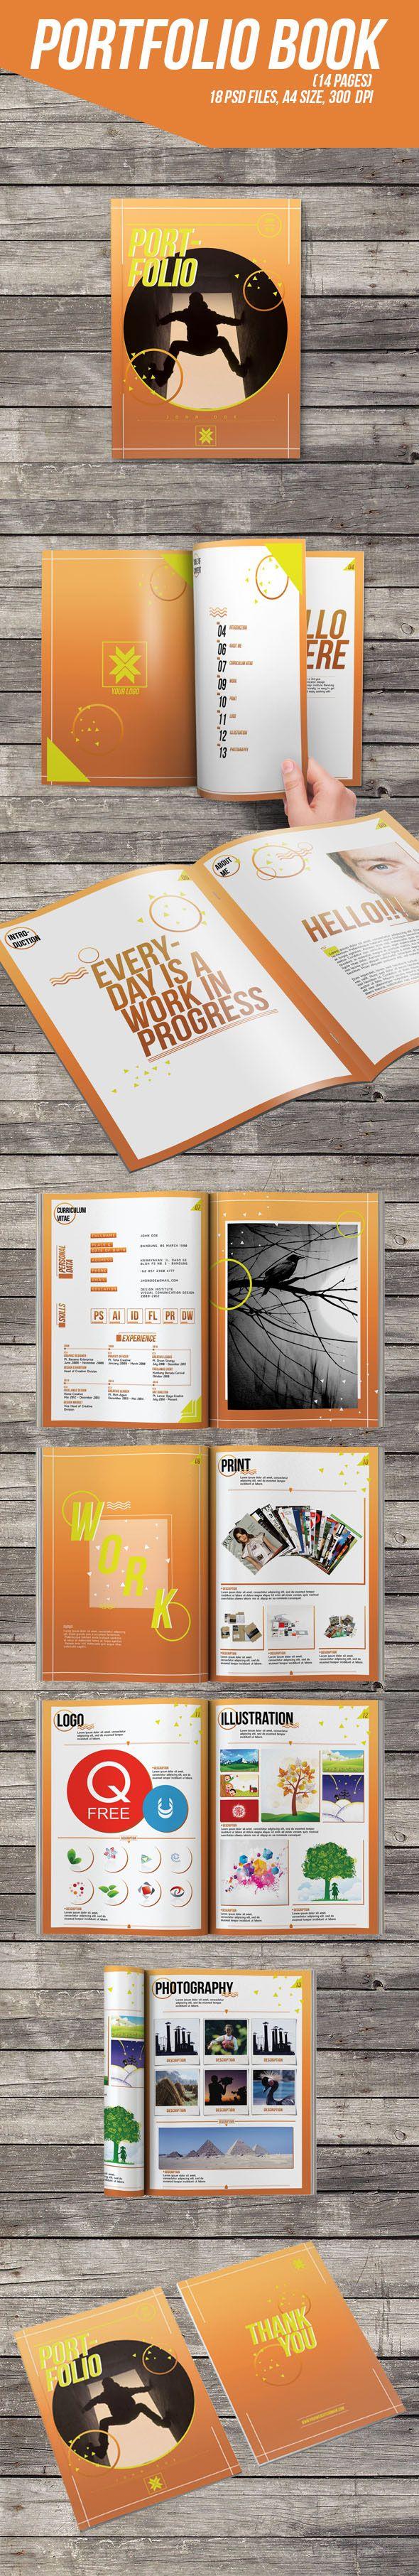 Portfolio Book (14 pages) on Behance